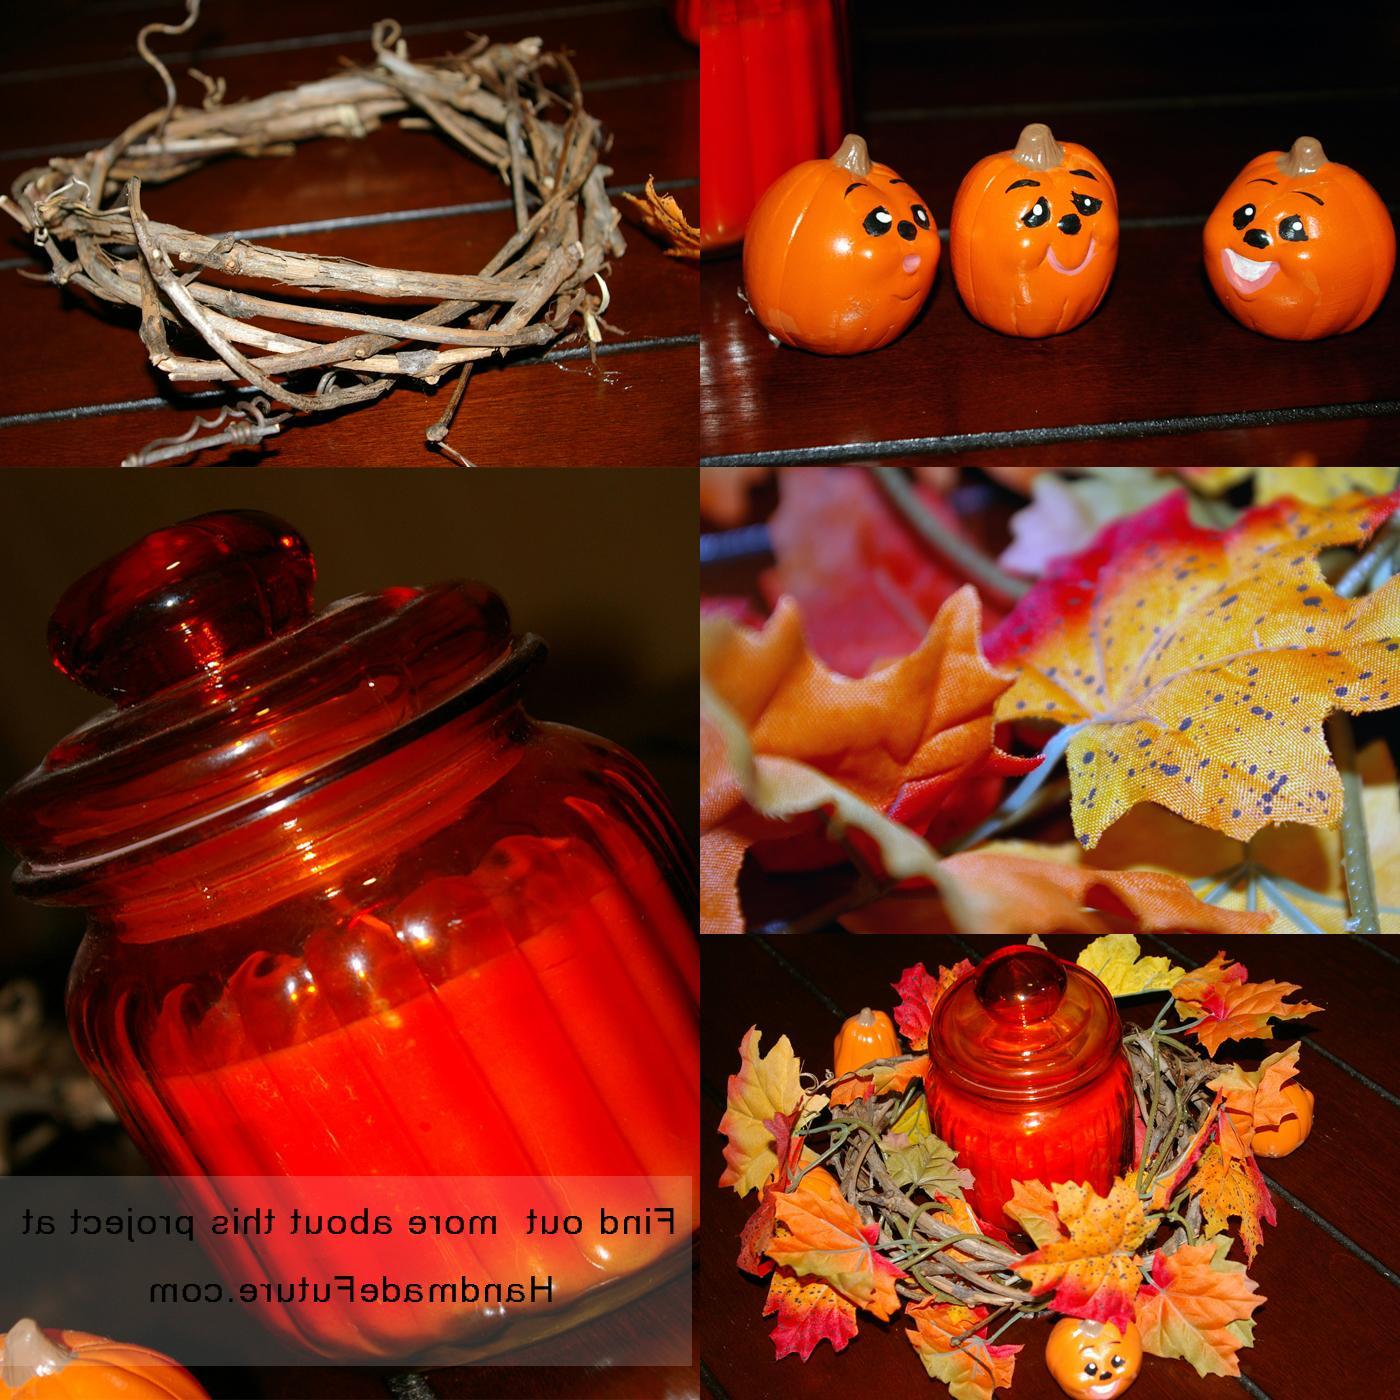 Step 3: Arrange the pumpkin